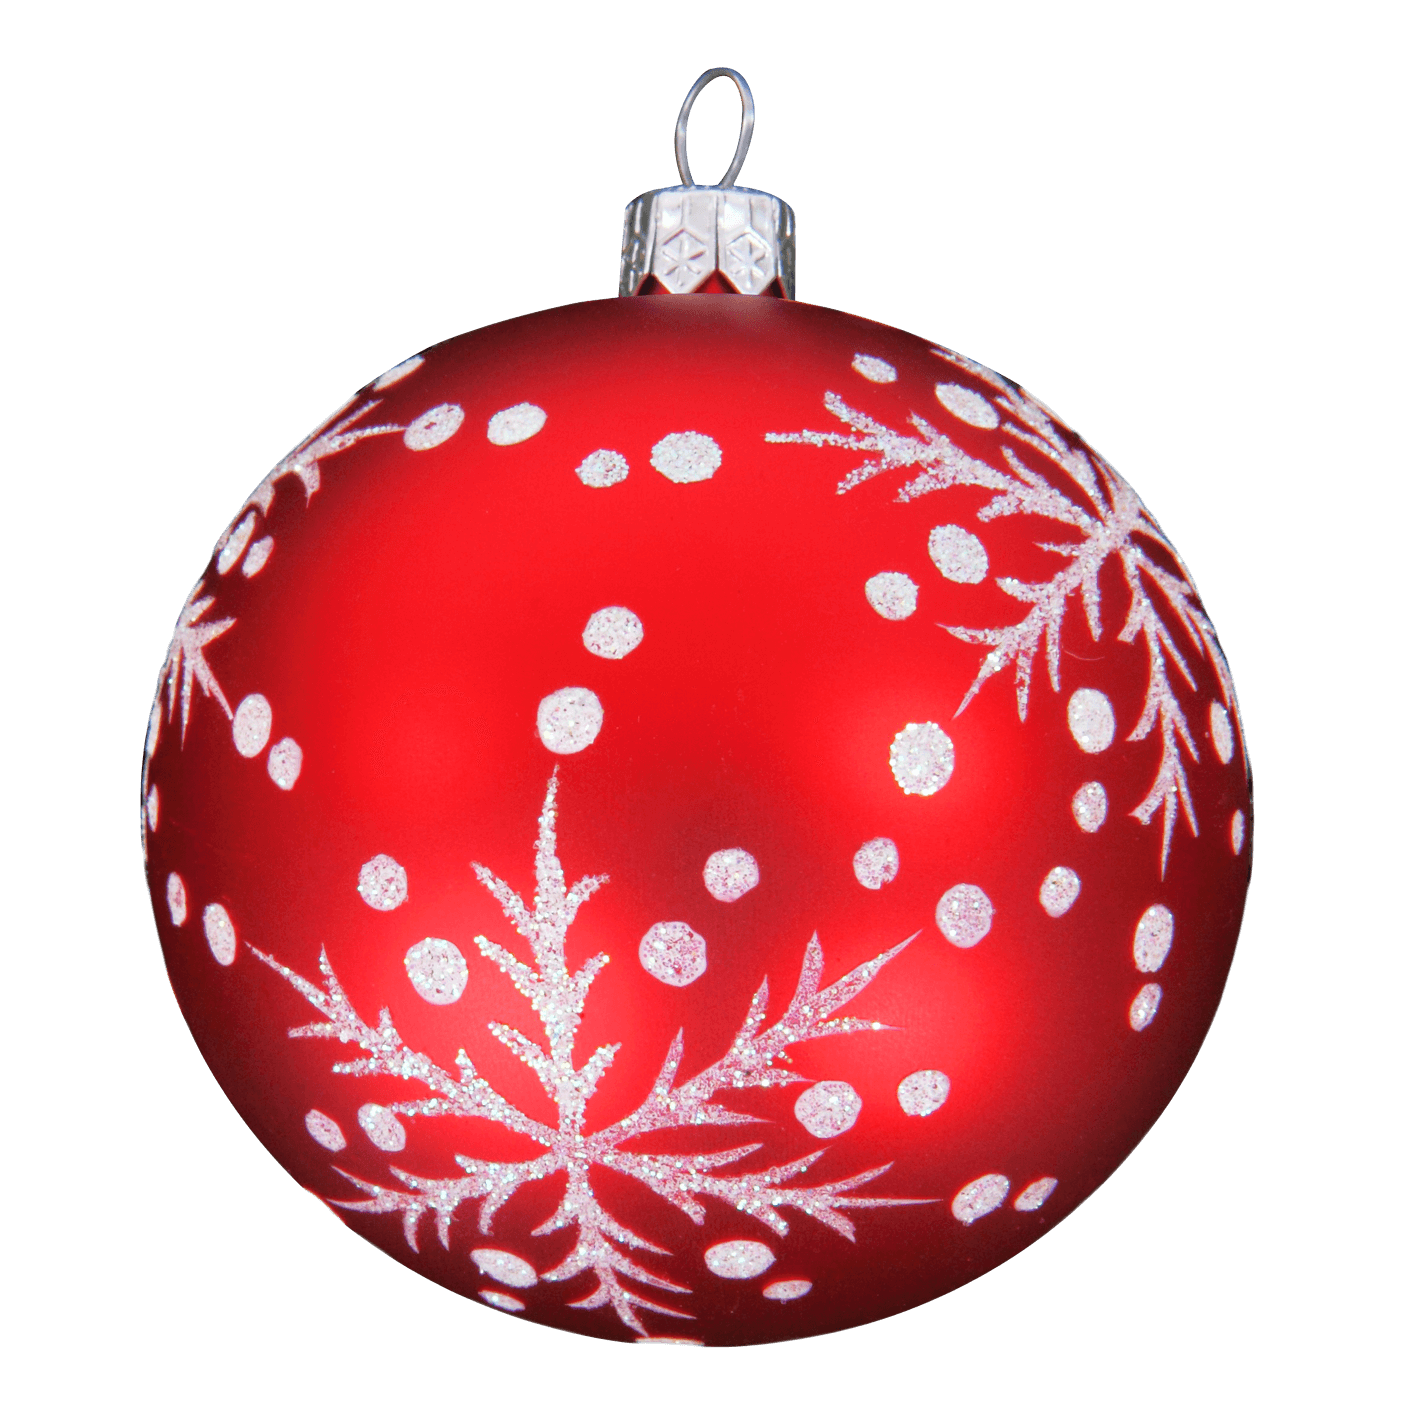 Christmas Ball PNG Transparent Image 2.